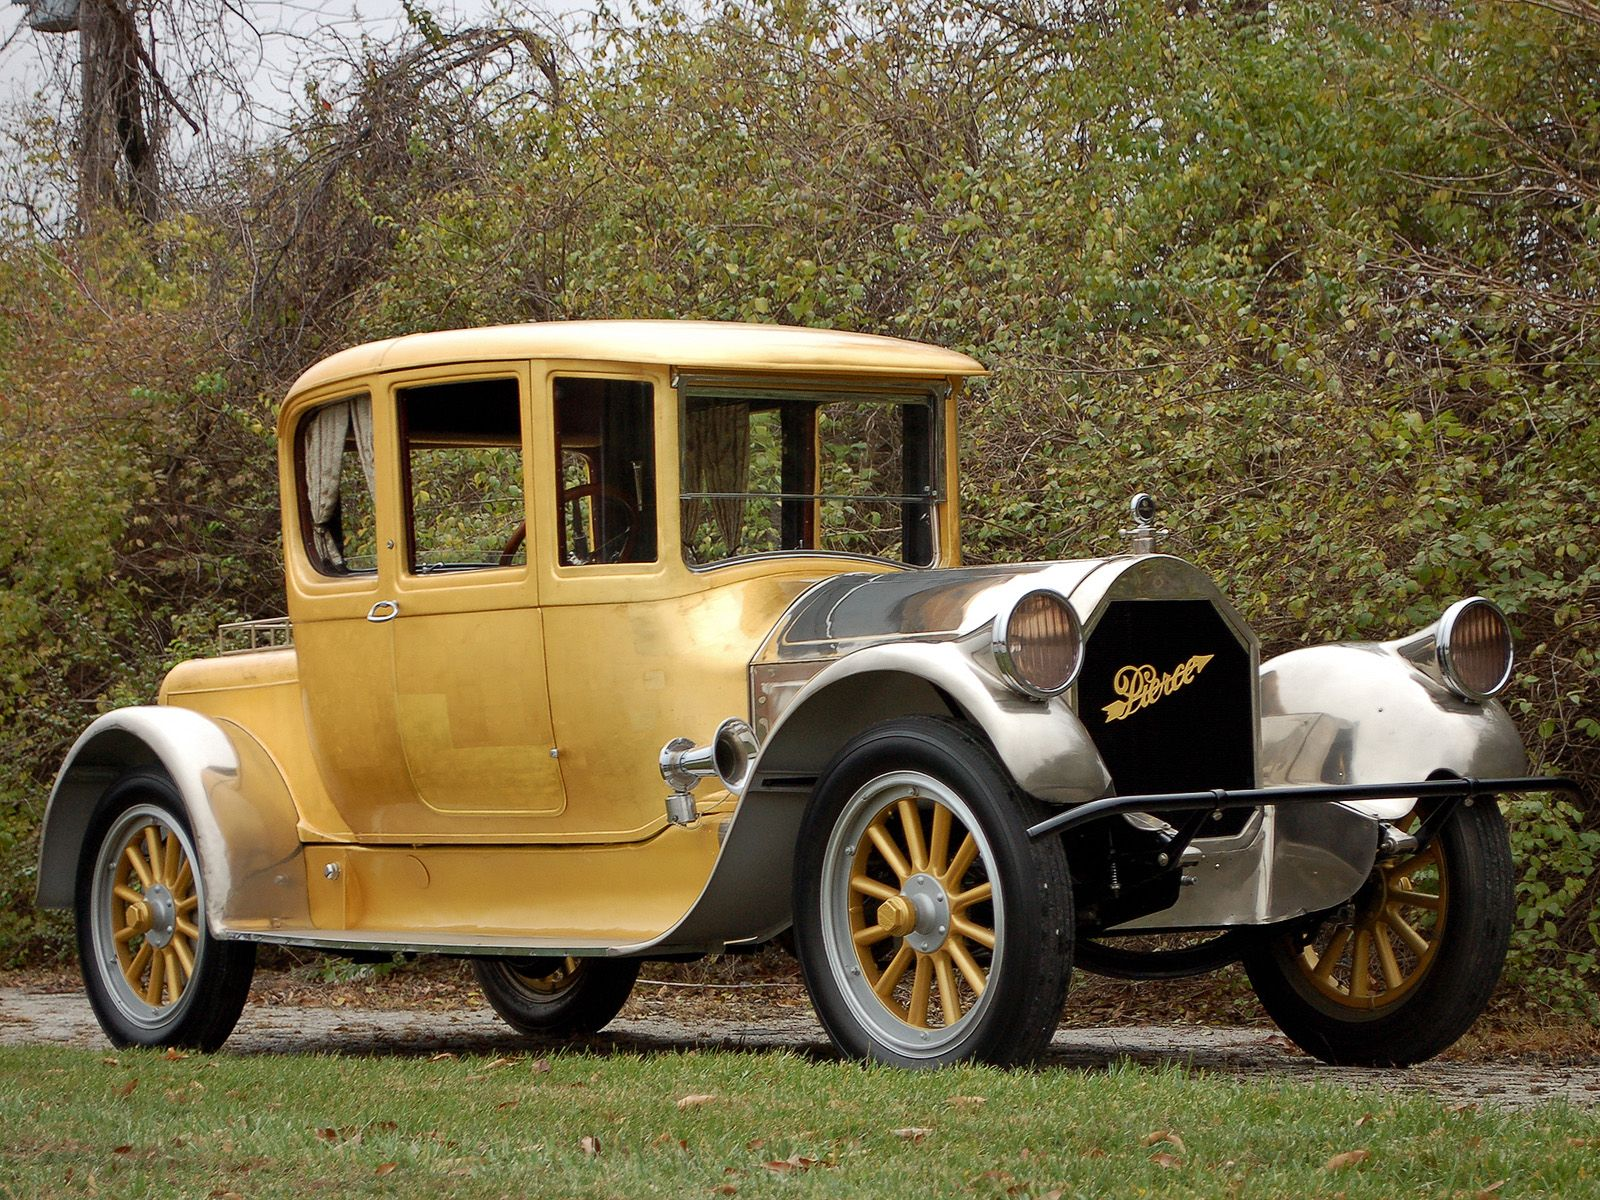 1920 Pierce Arrow Model 48 Coupe Series 51 Retro J Wallpaper 1600x1200 145728 Wallpaperup Classic Cars Vintage Cars Coupe Cars